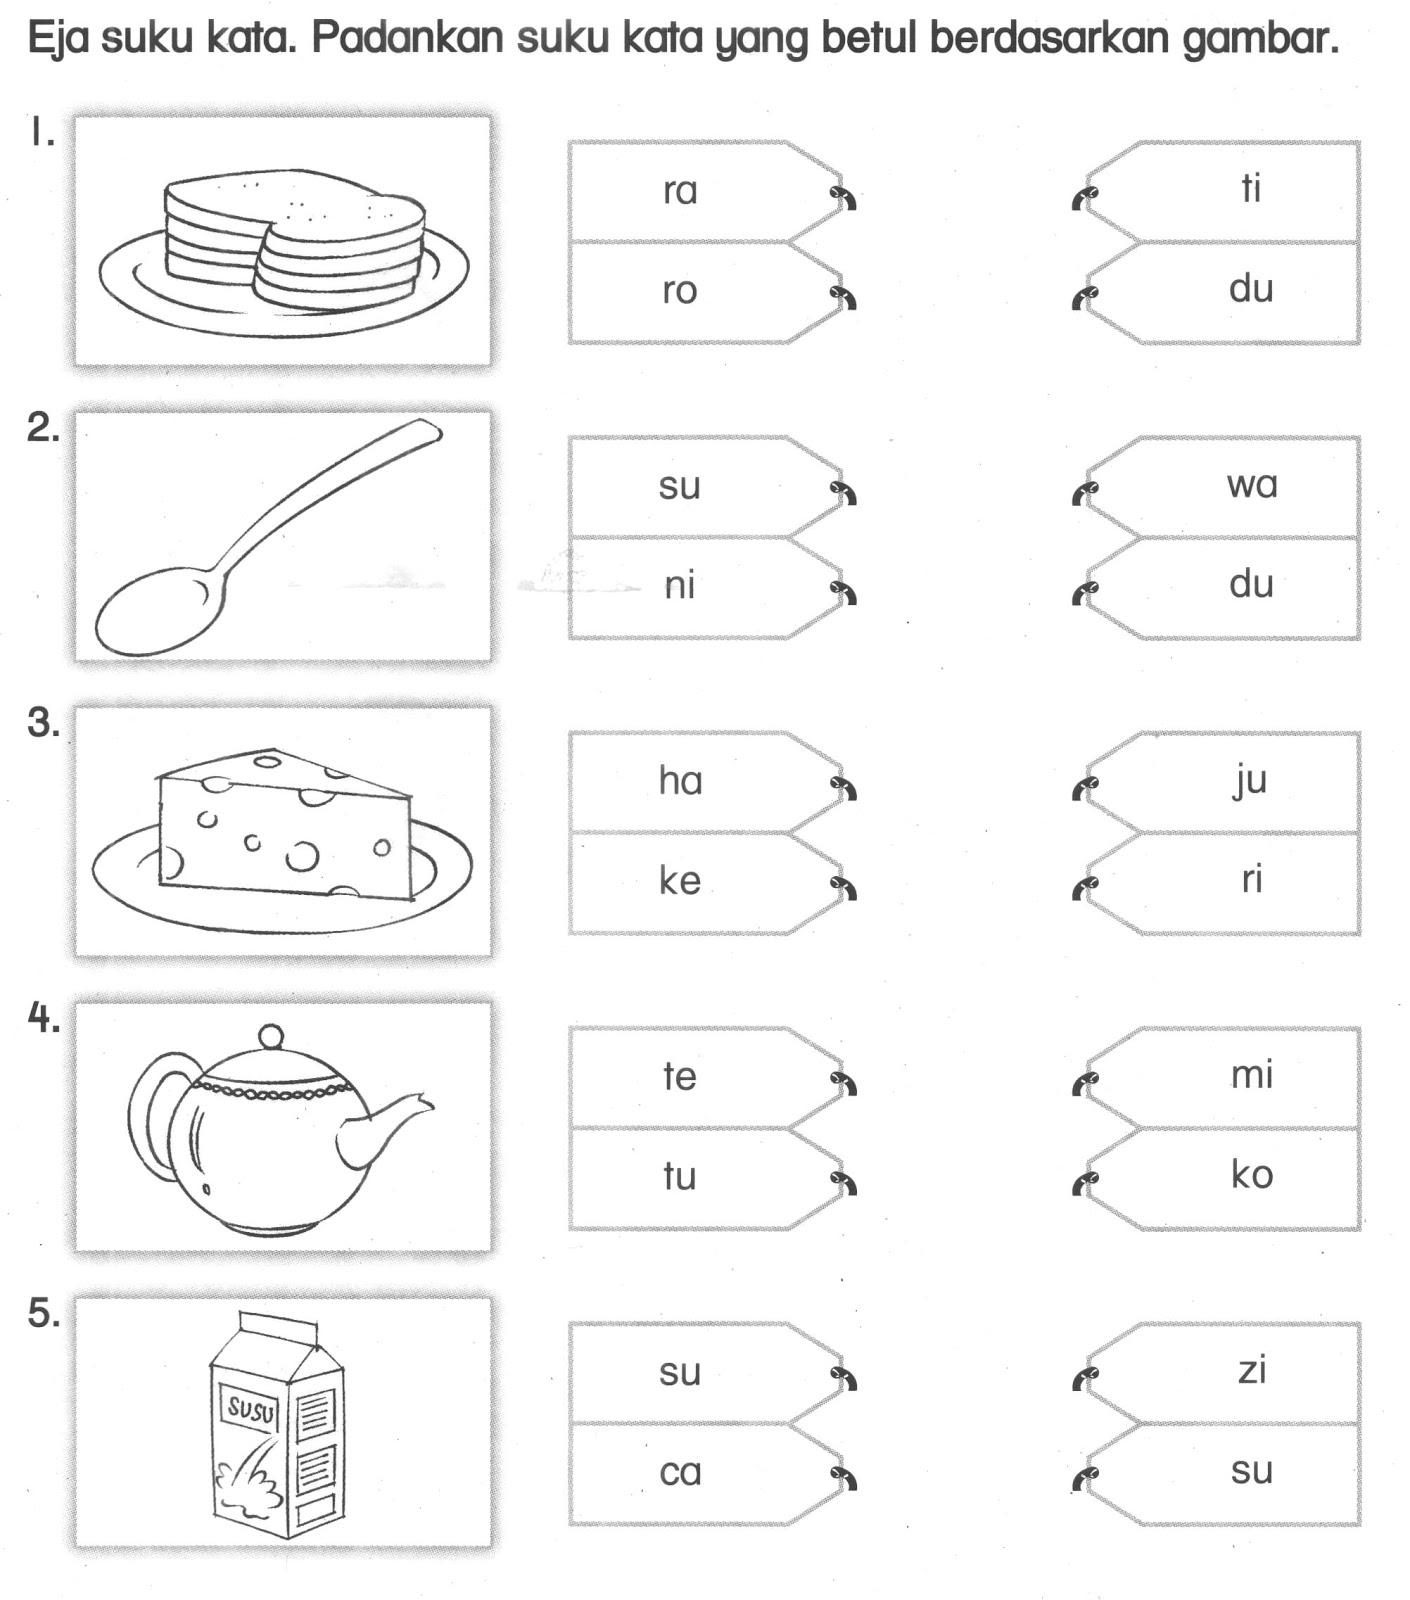 Suku Kata Worksheet Printable Worksheets And Activities For Teachers Parents Tutors And Homeschool Families